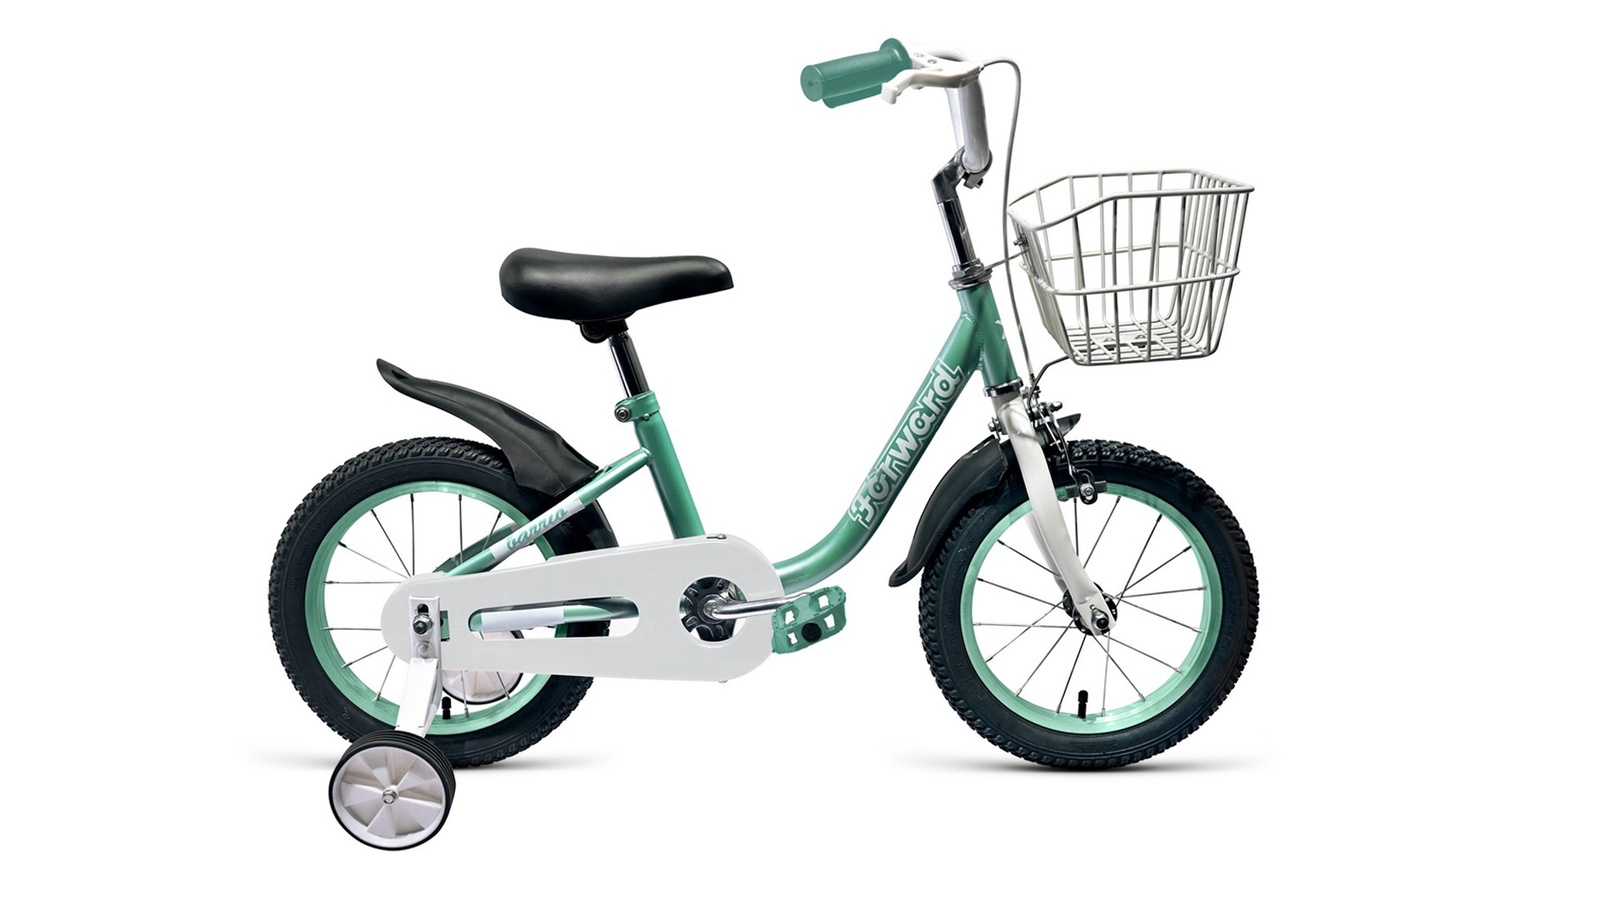 Велосипед Forward Barrio 14 2019, бирюзовый велосипед forward barrio 14 2019